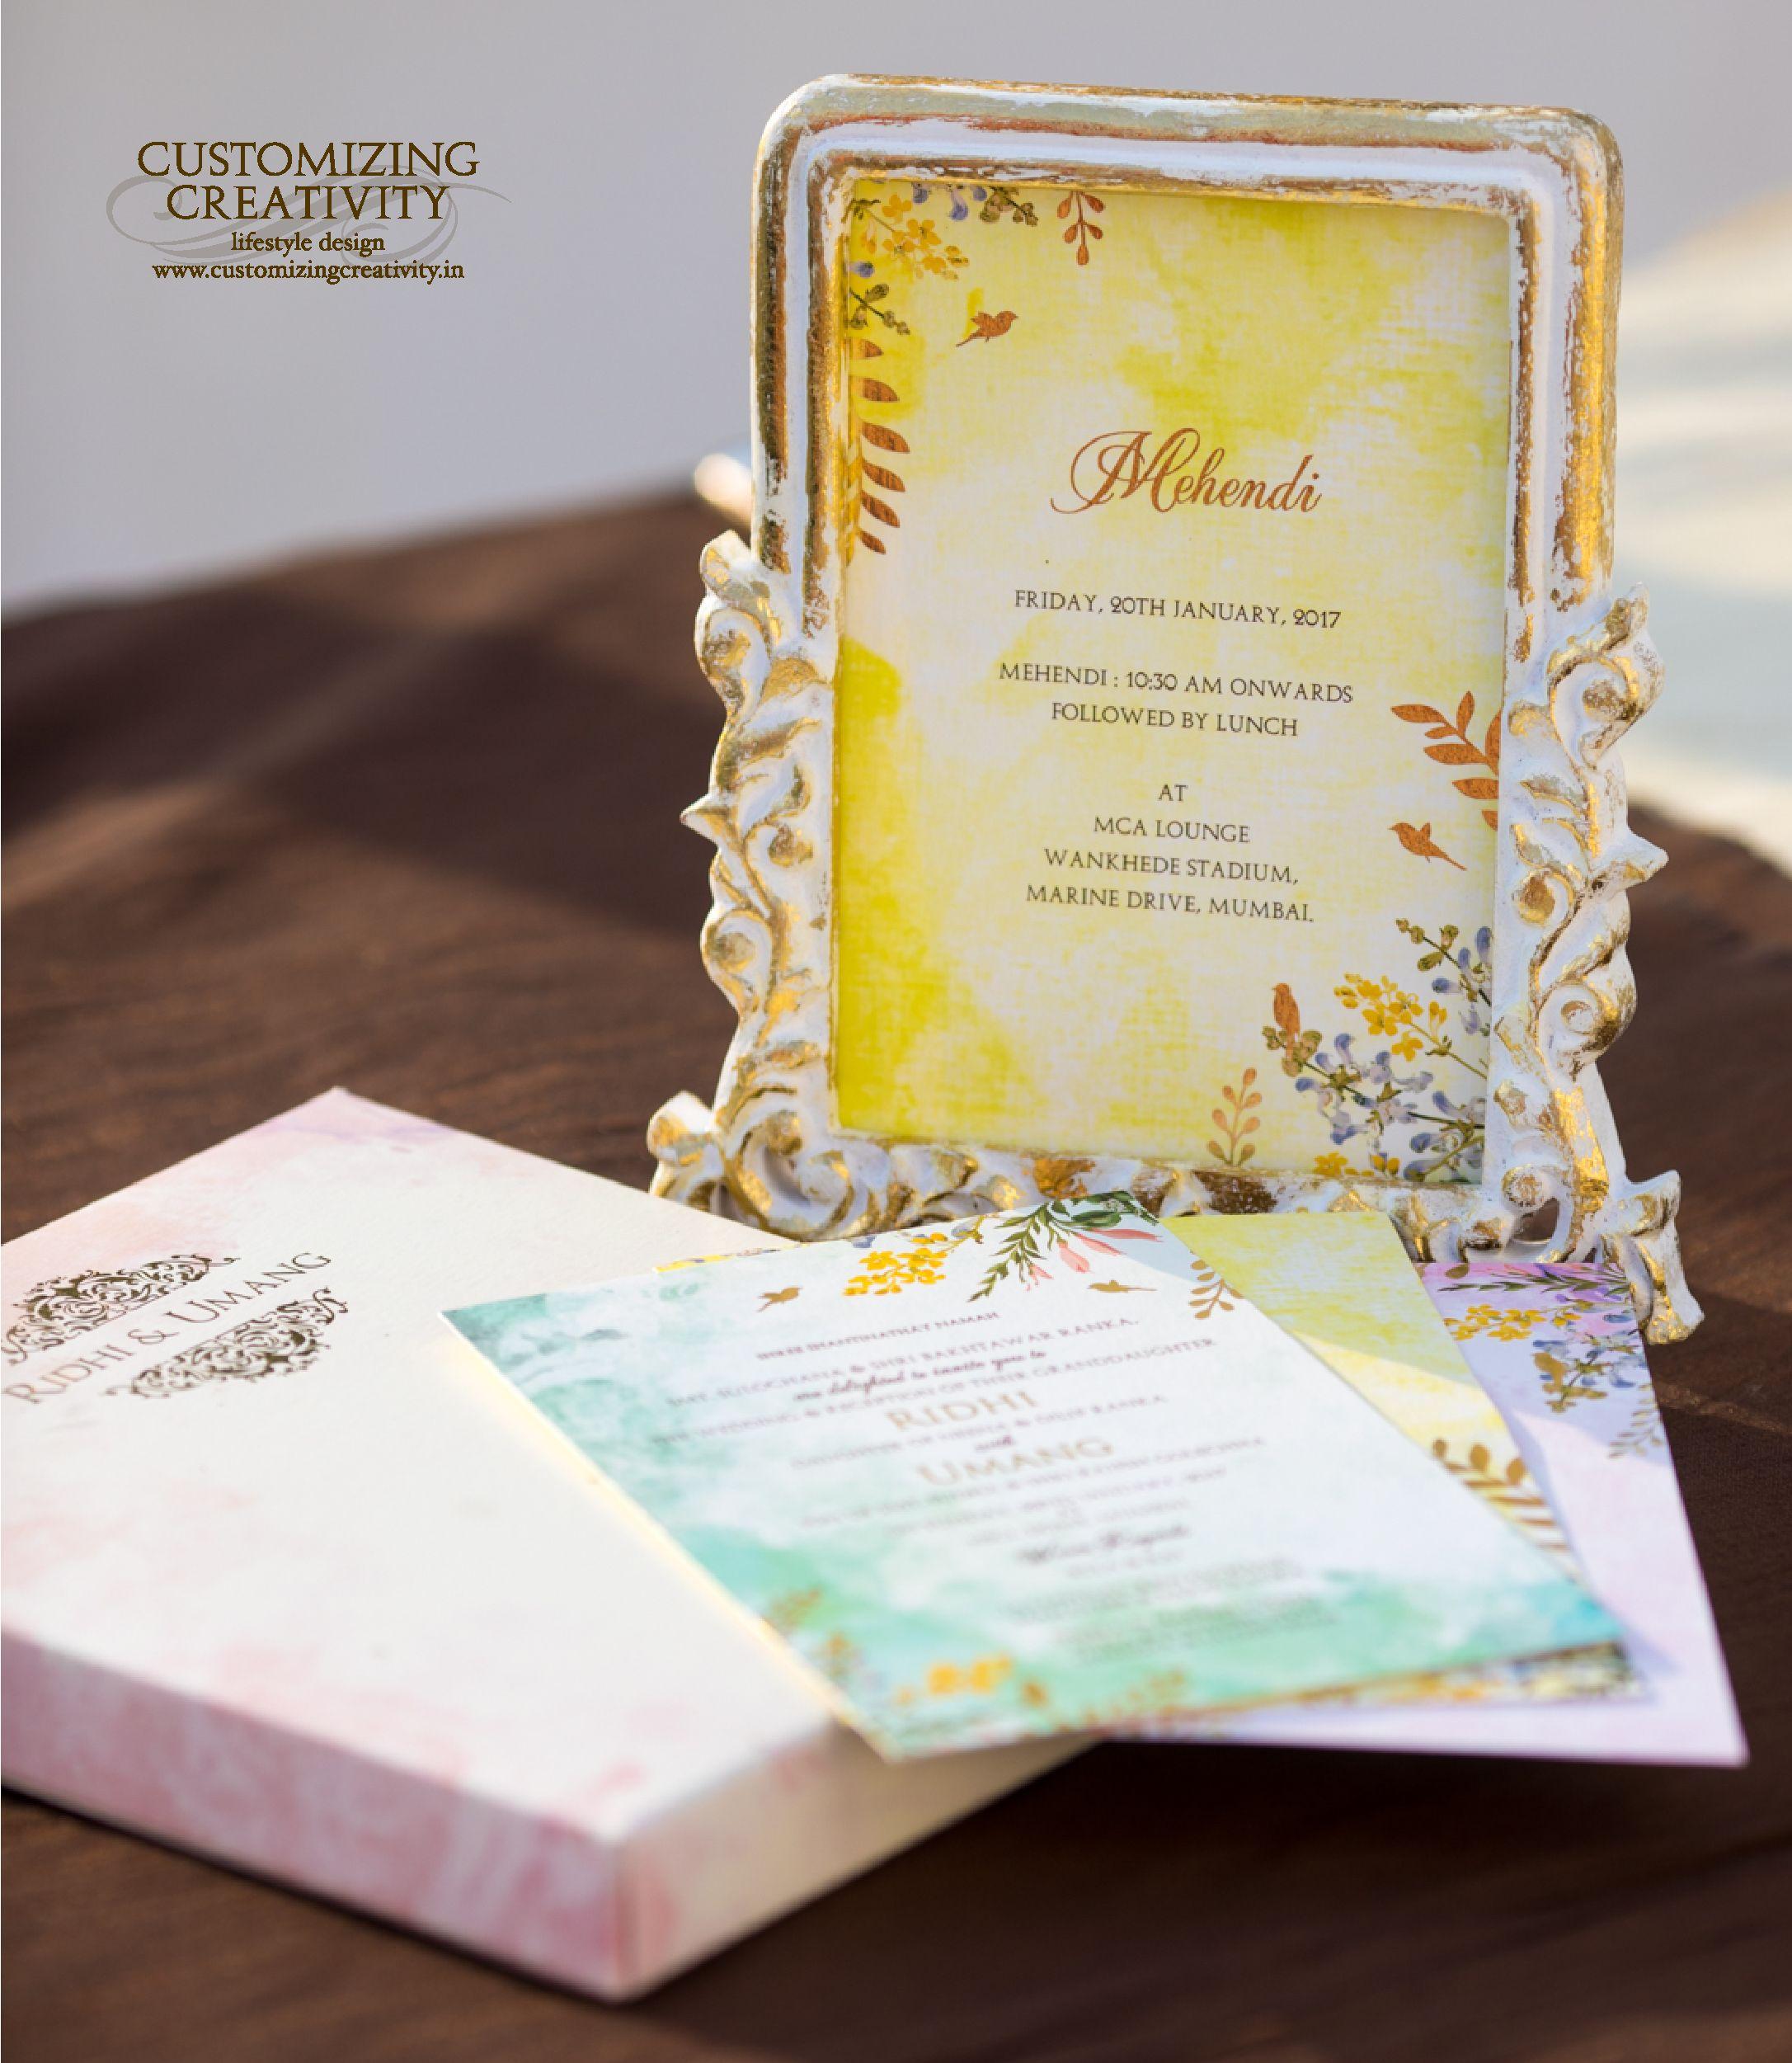 wedding invitation cards mumbai india%0A Wedding Invitation cards  Indian wedding cards  invites  Wedding  Stationery  Customized invitations